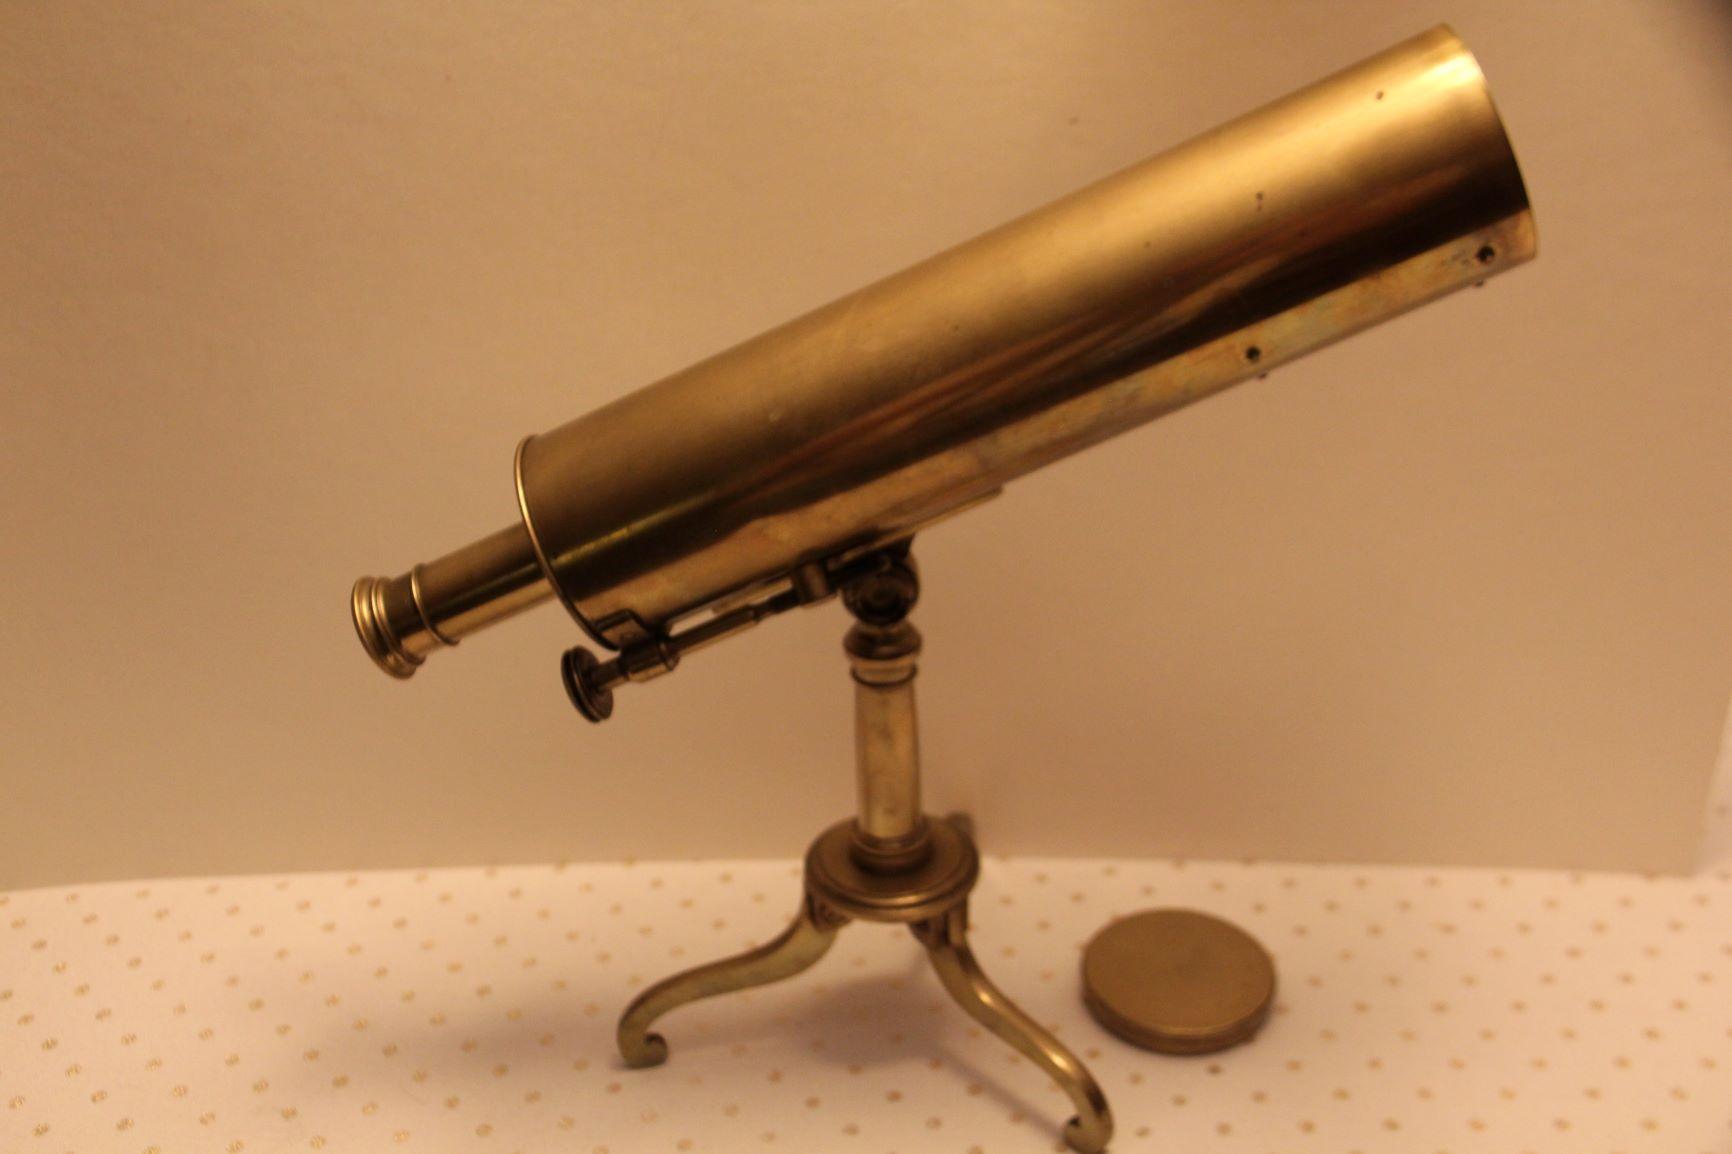 ~GOOD 2 3/4 INCH DIAMETER REFLECTING TELESCOPE by JOHN CUTHBERT~(ON HOLD)